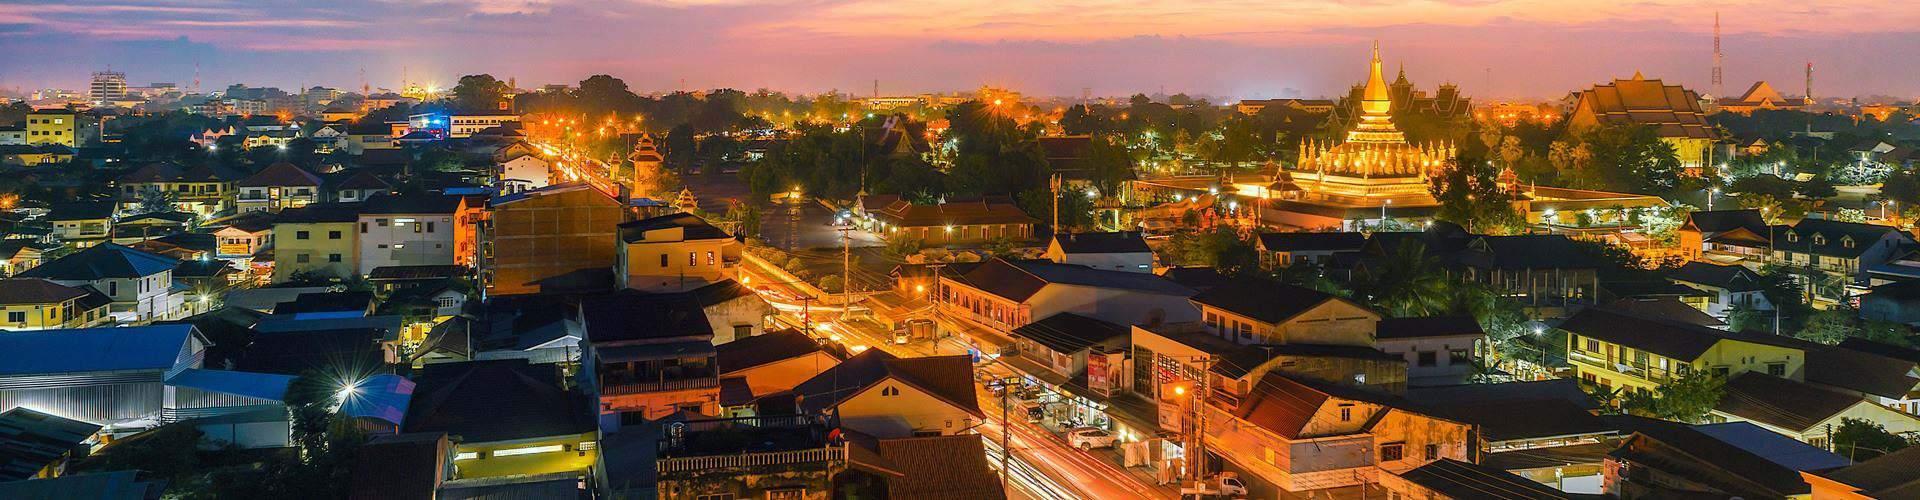 The night scene of downtown Vientiane